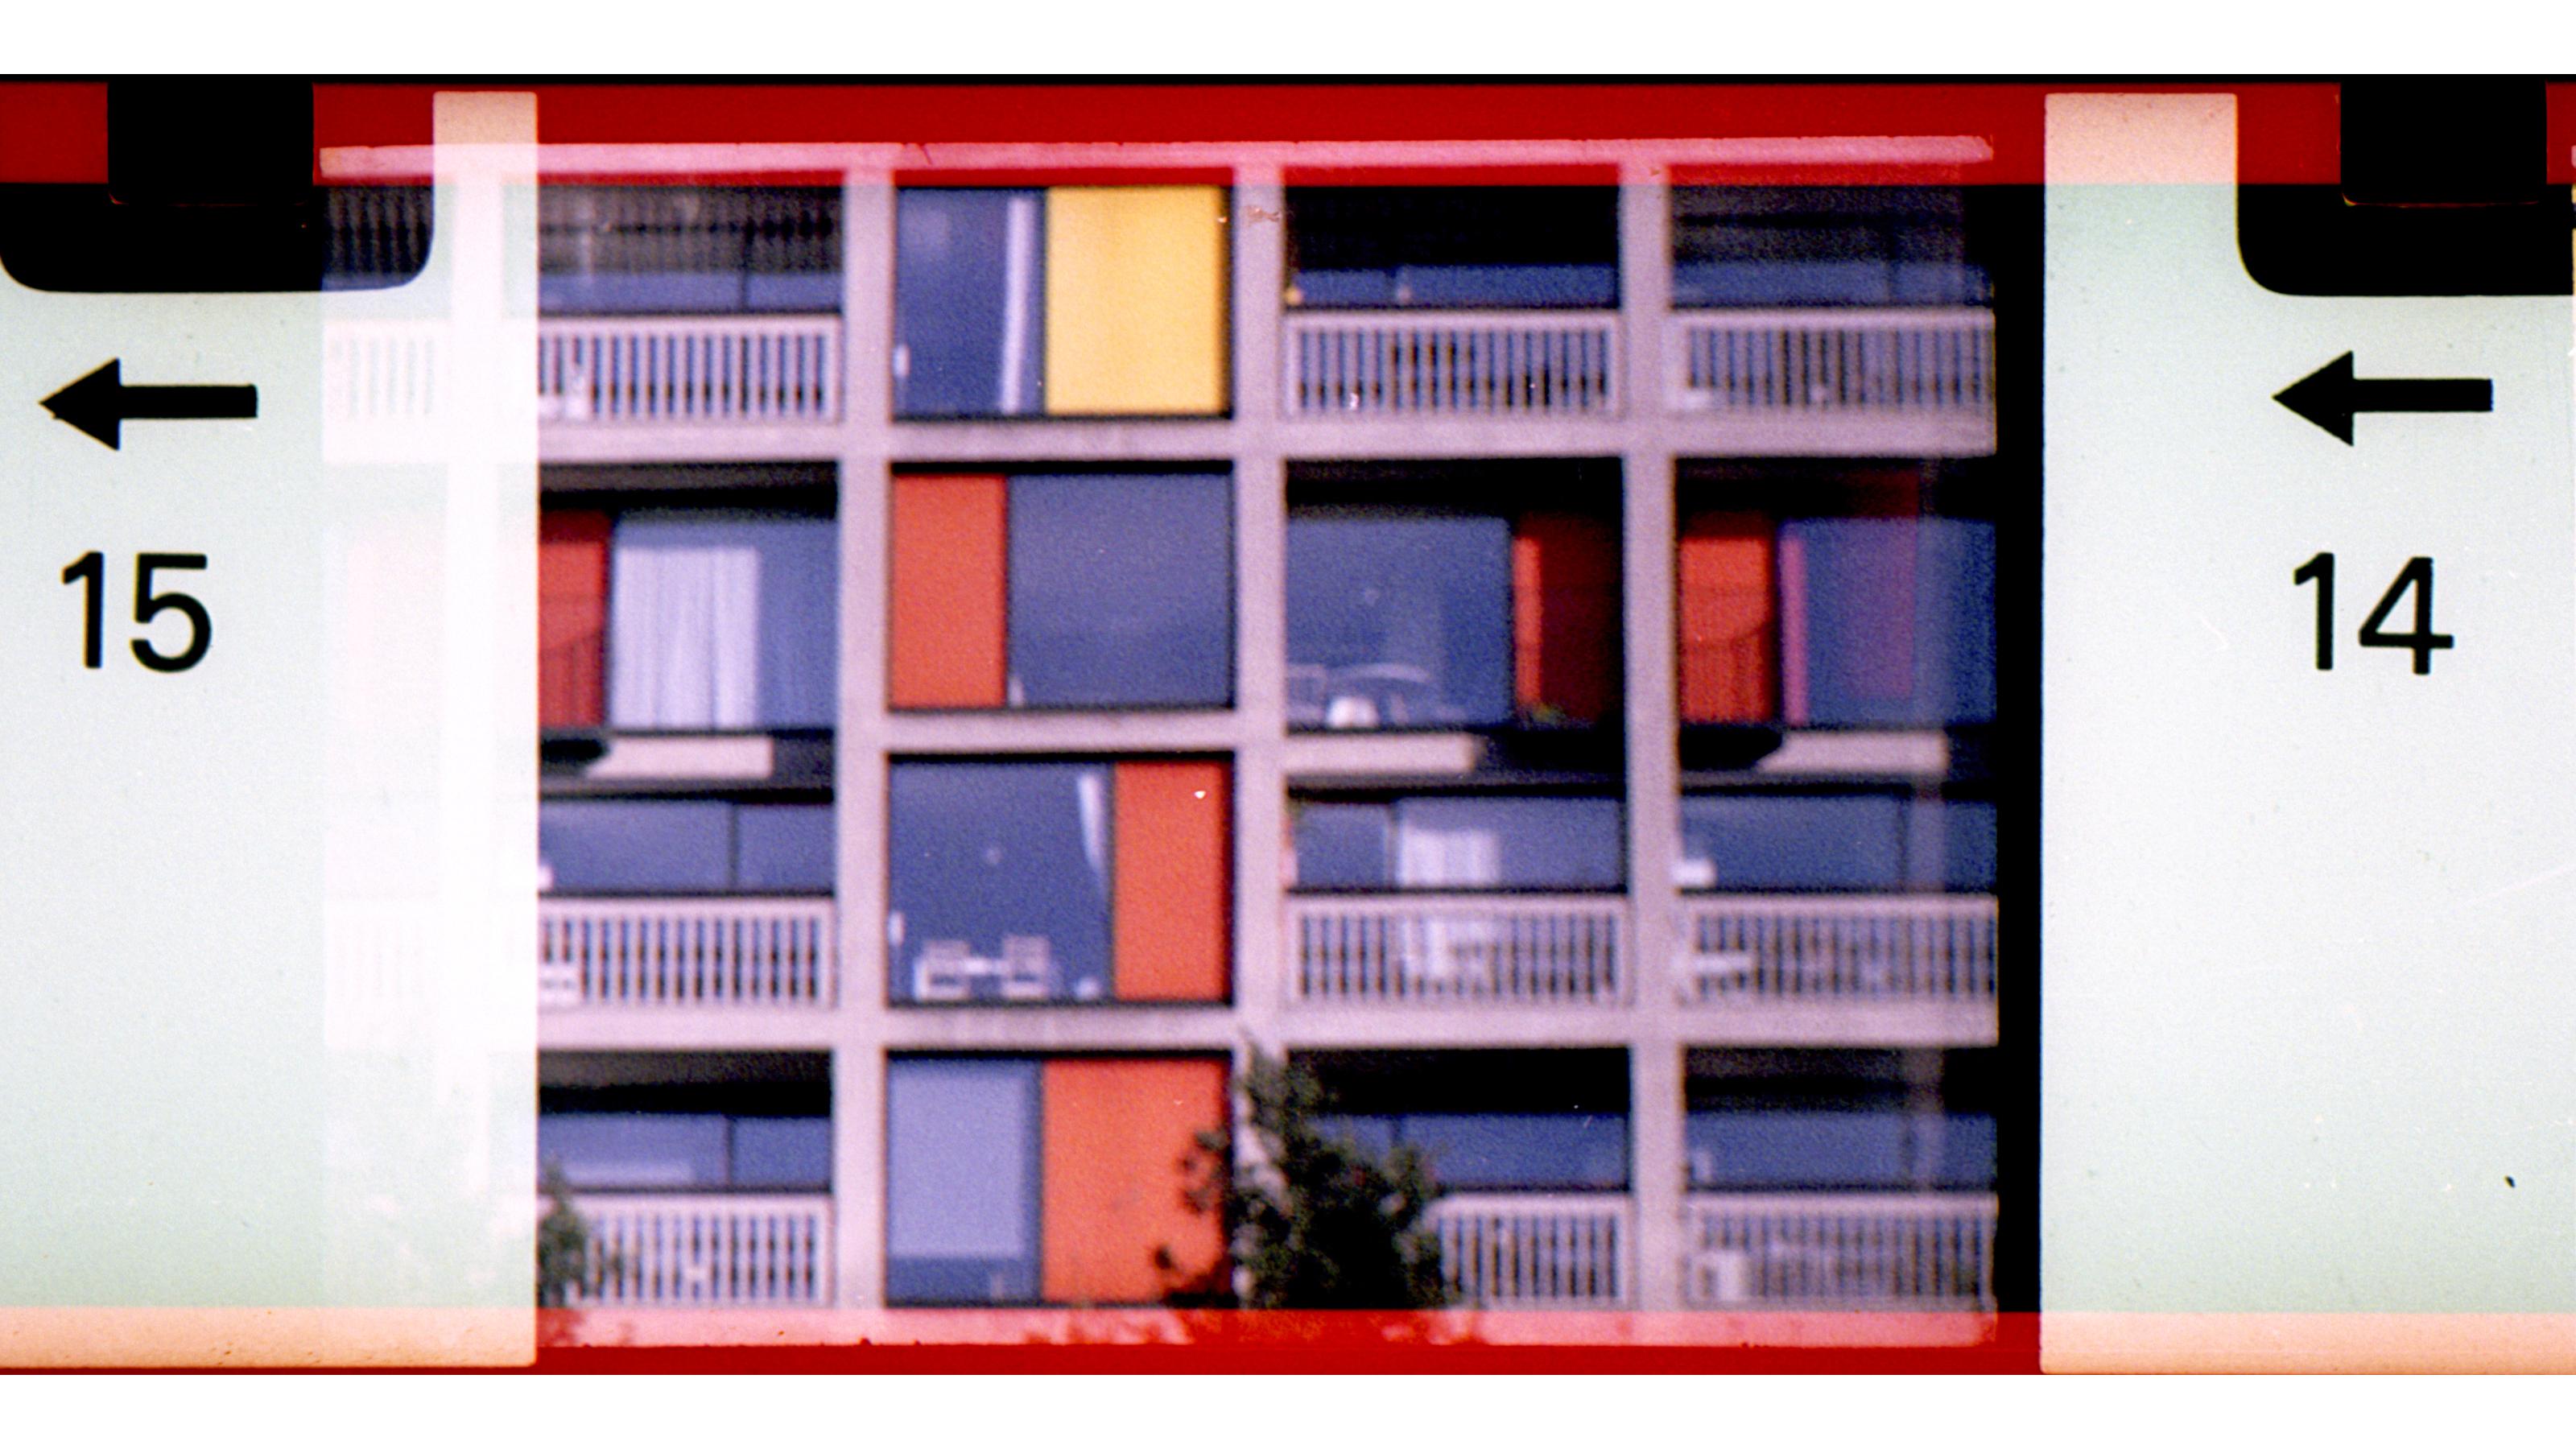 Photo of a block of flats taken with the Tasco 7900 Binocular Camera